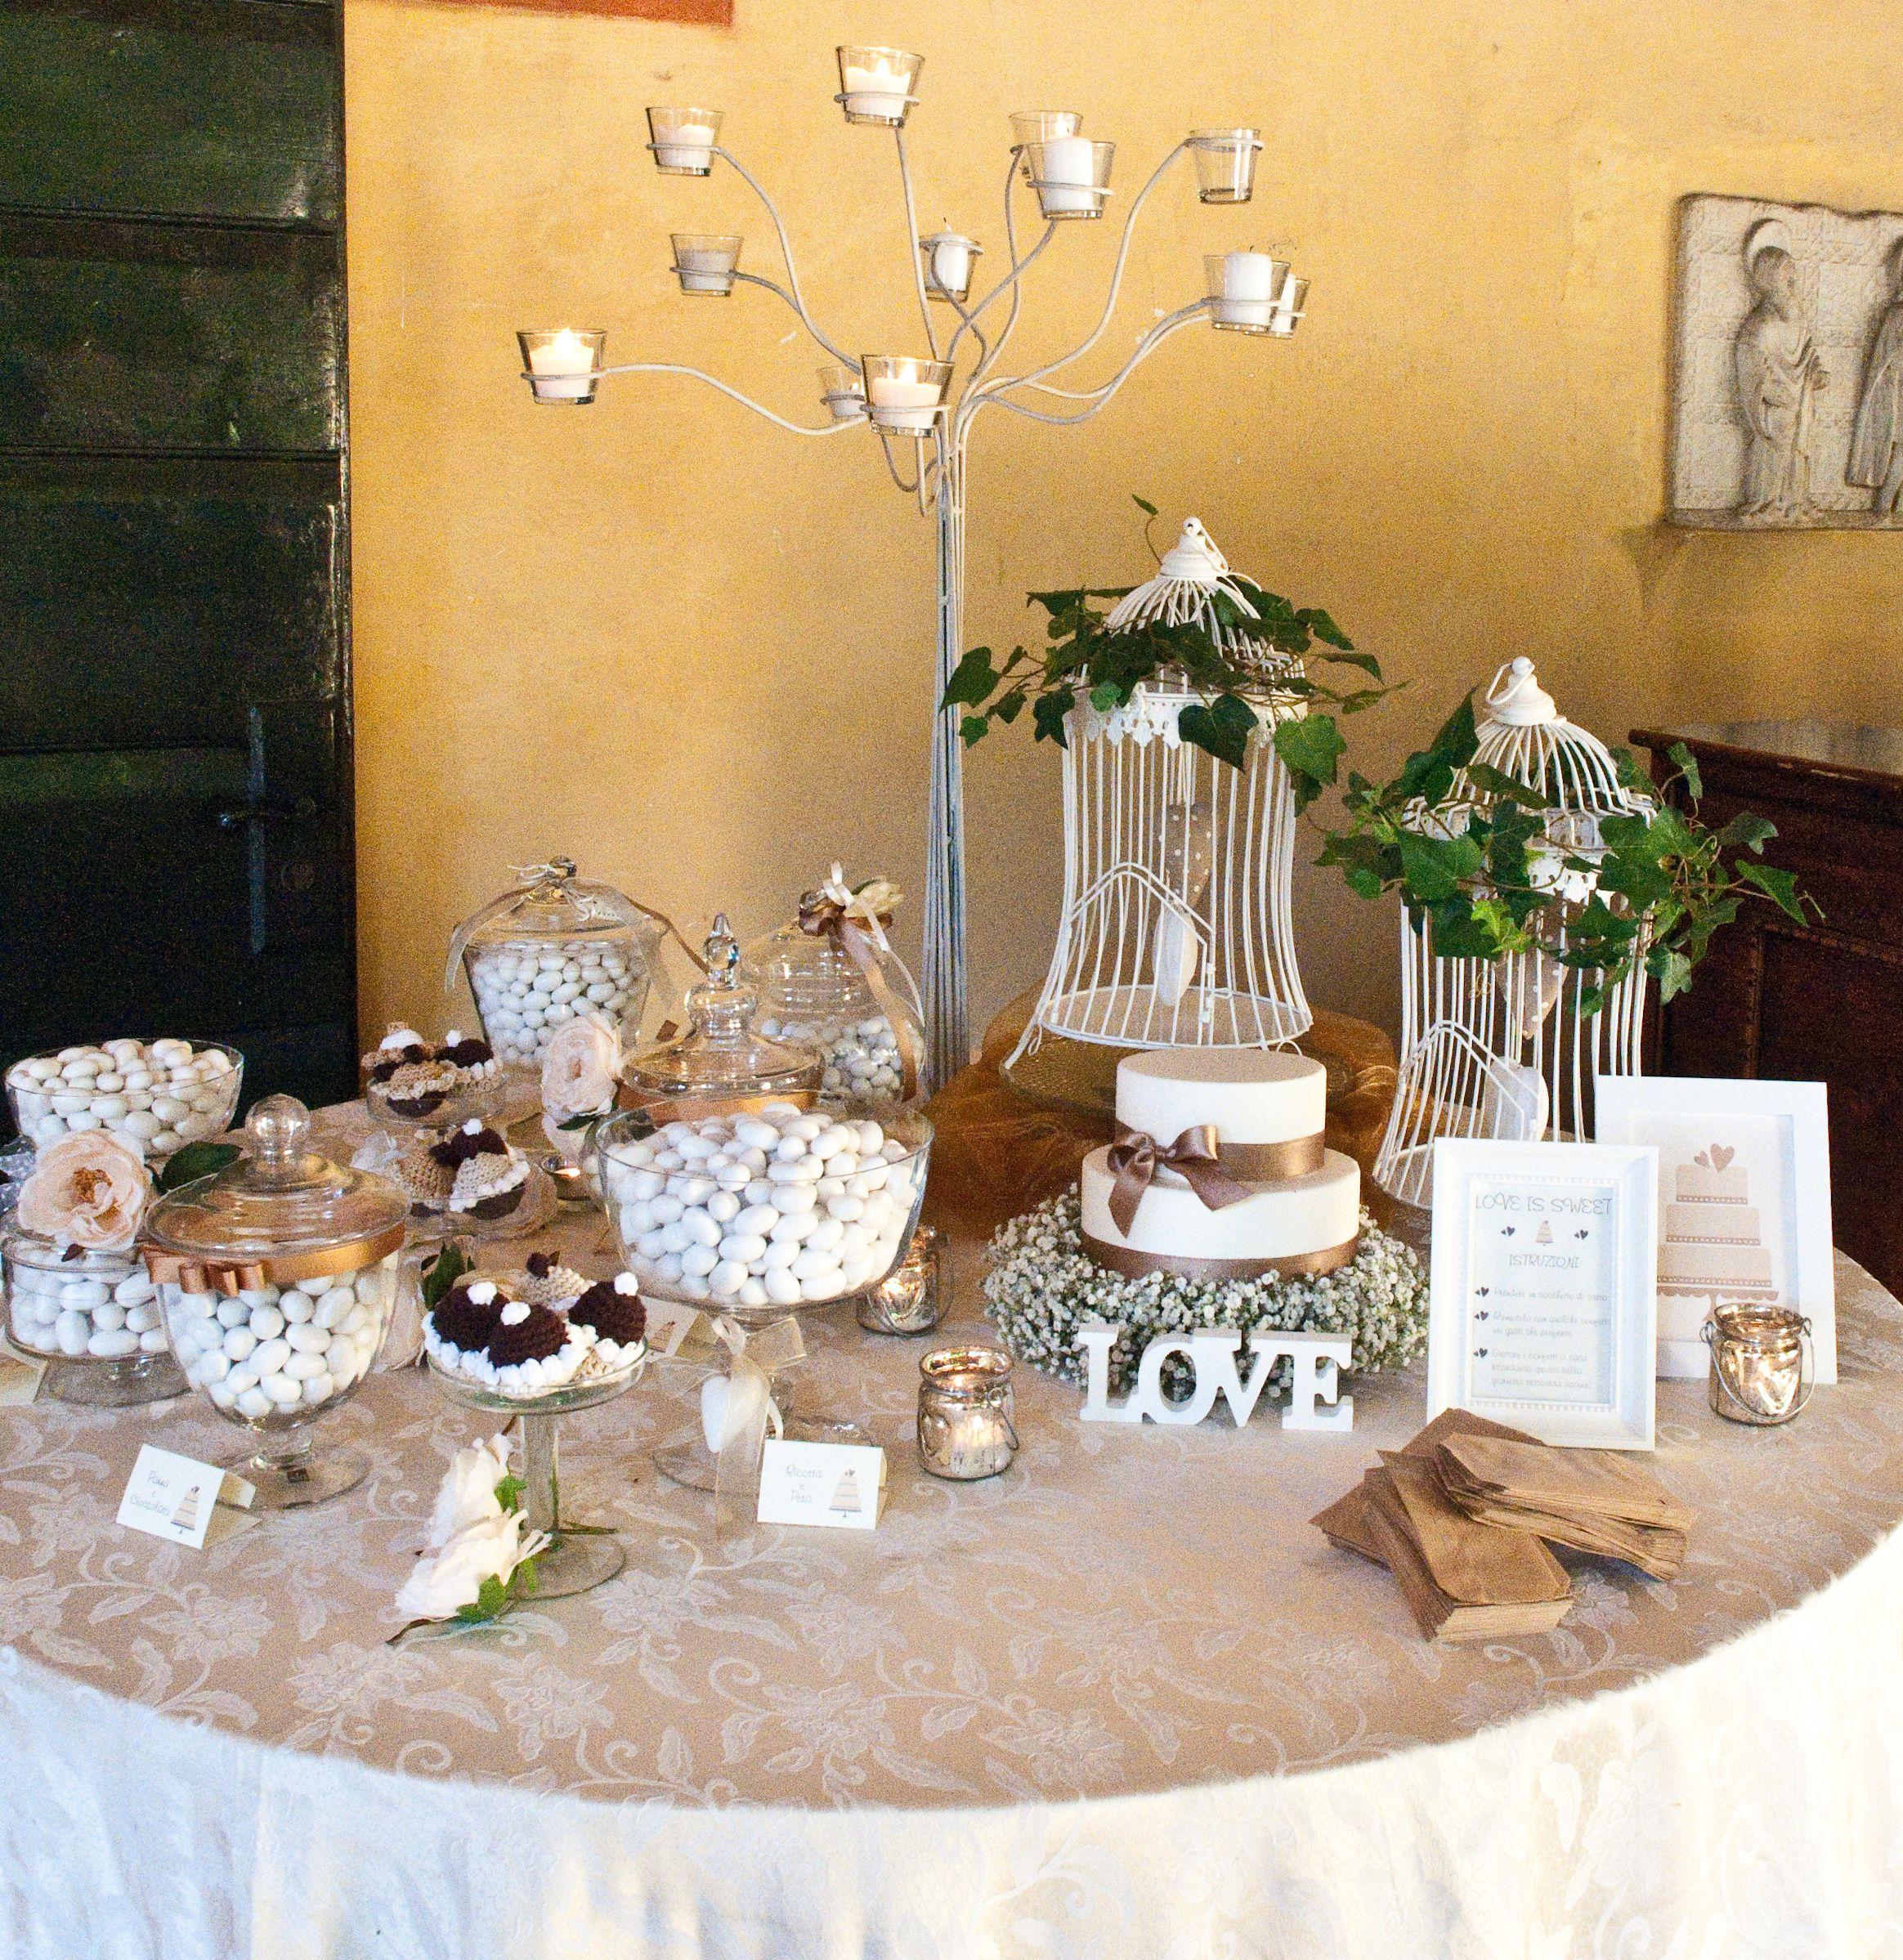 Pin di Giorgia Bussolotto su italian candy buffet | Buffet ...